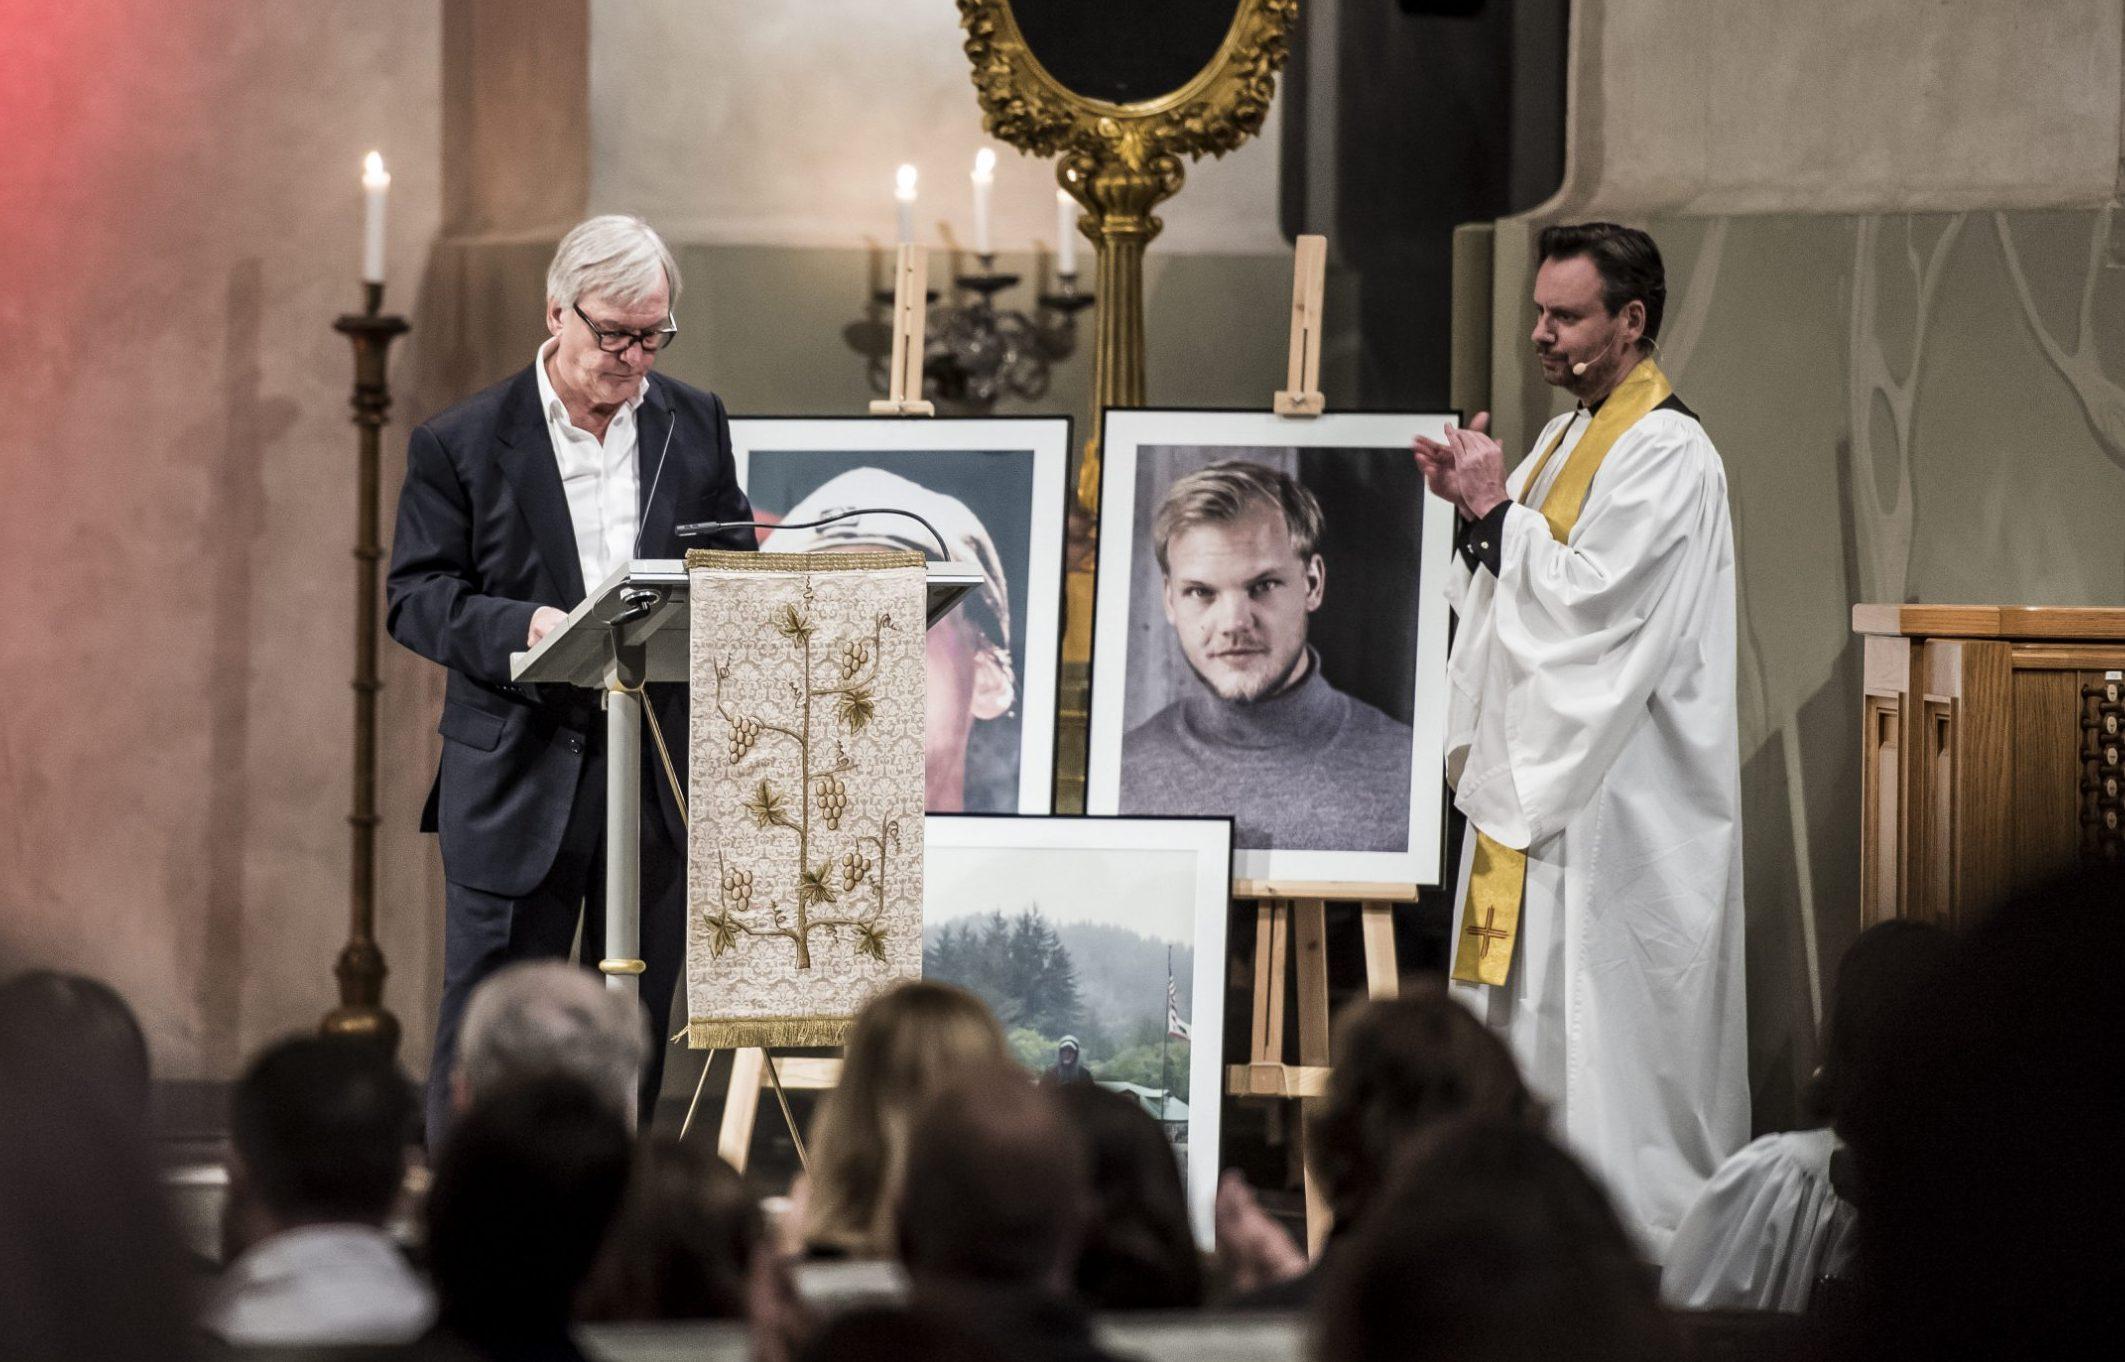 Mandatory Credit: Photo by IBL/REX (9982560t) Avicii's father, Klas Bergling, gives a speech Avicii Memorial Service, Stockholm, Sweden - 16 Nov 2018